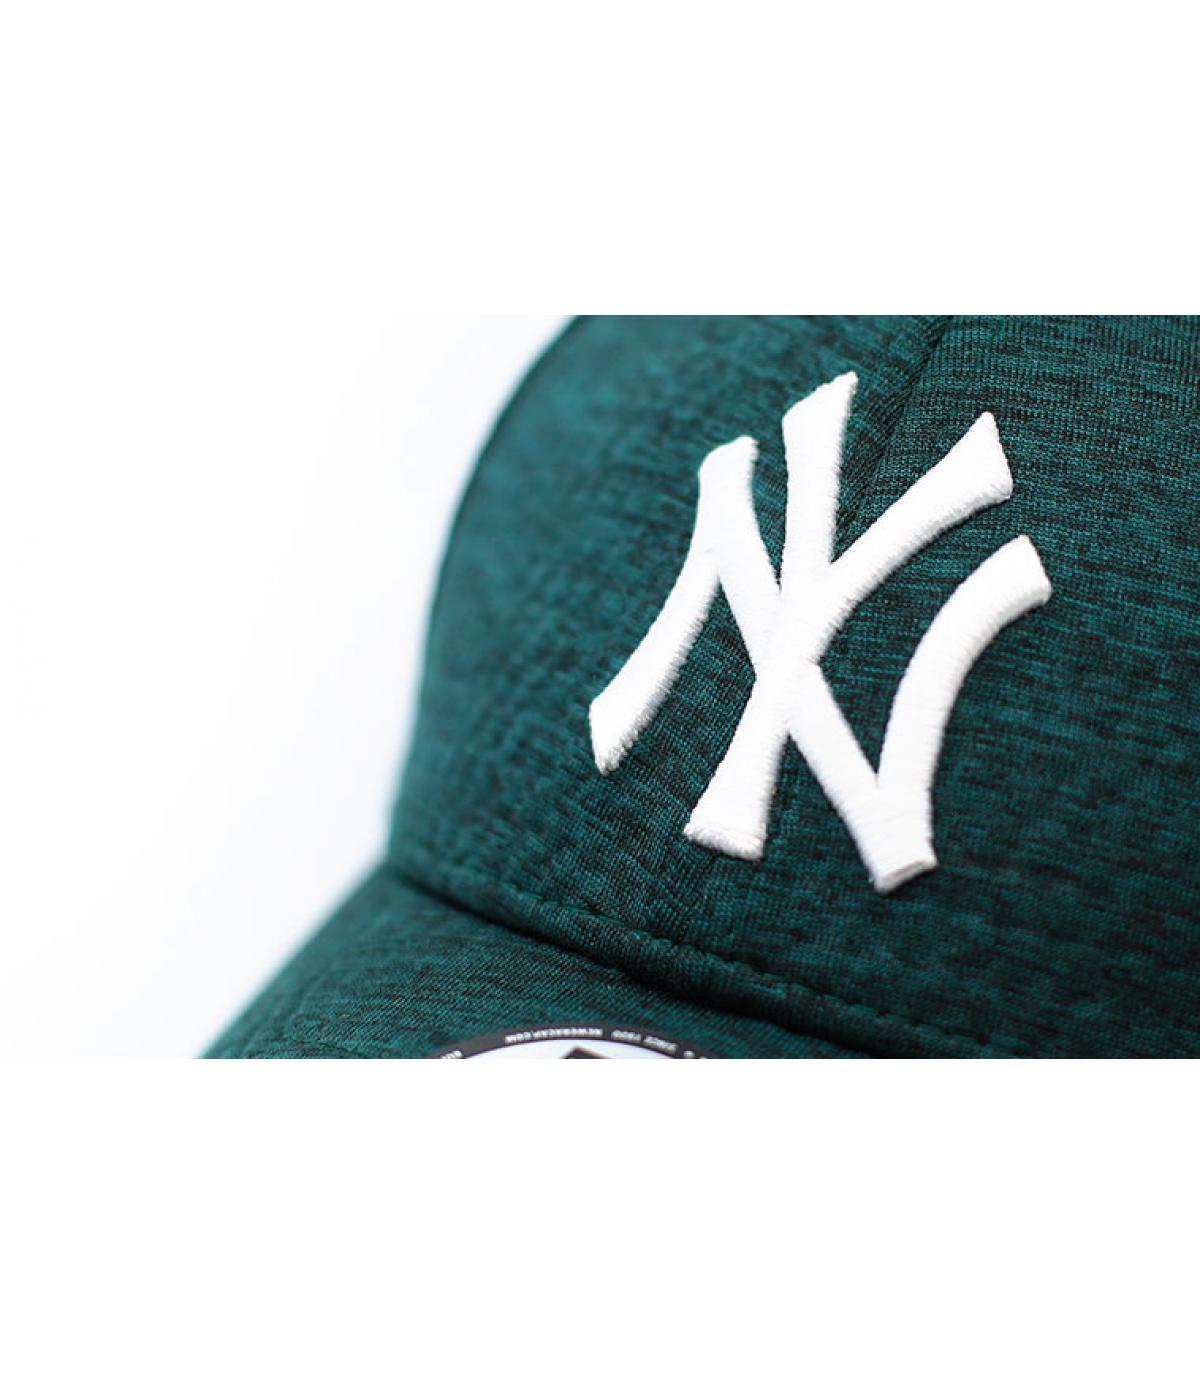 Dettagli Dry Switch NY 9Forty dark green - image 3